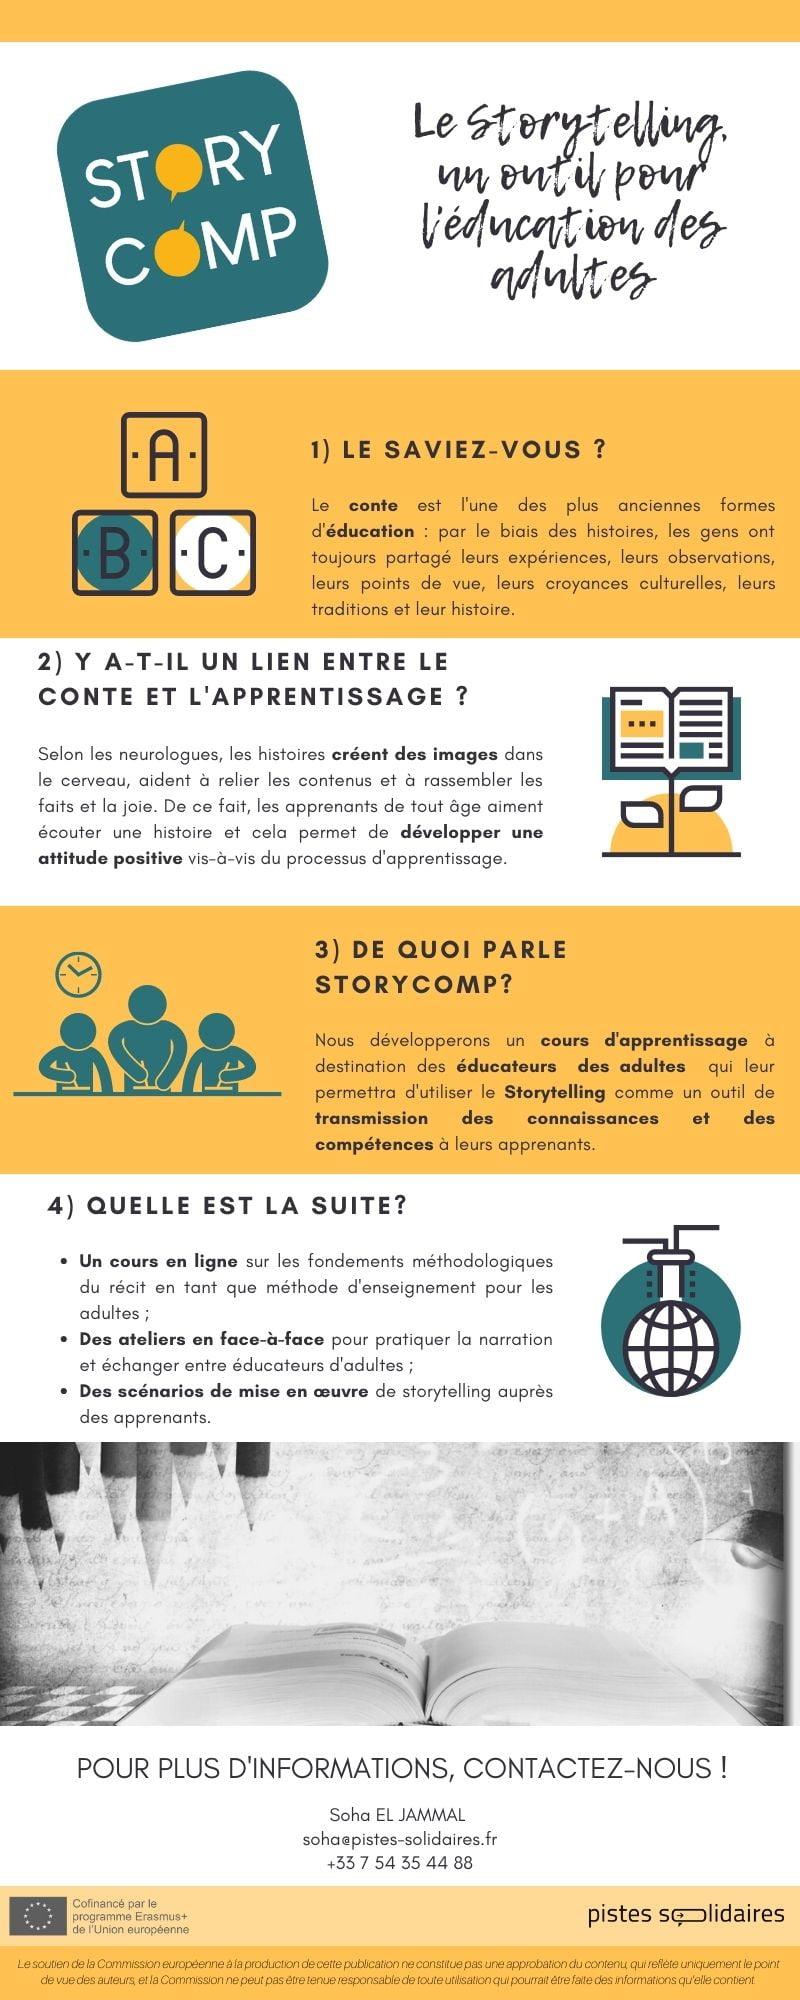 Storycomp-Infographie-1-FR-PISTES